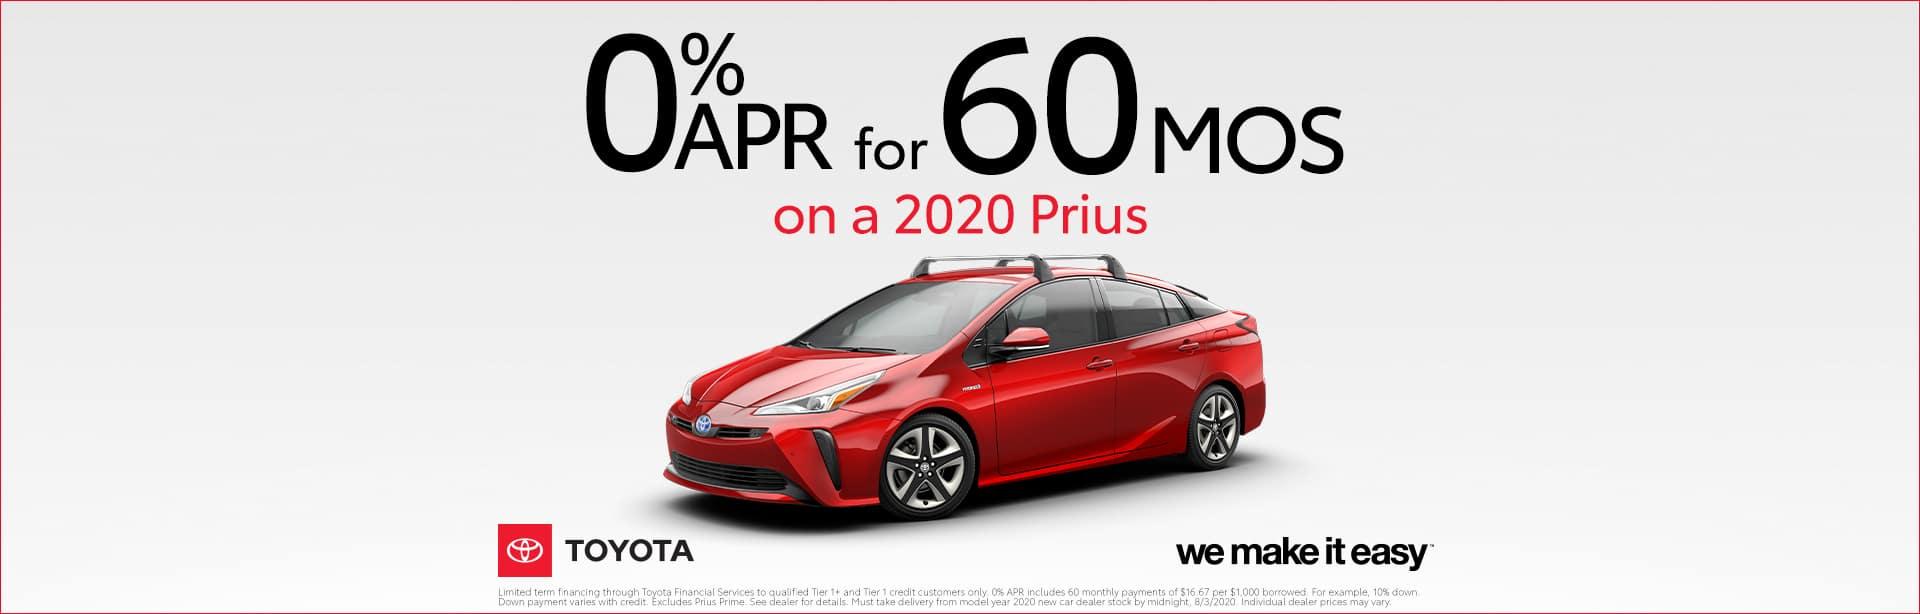 Prius 0%